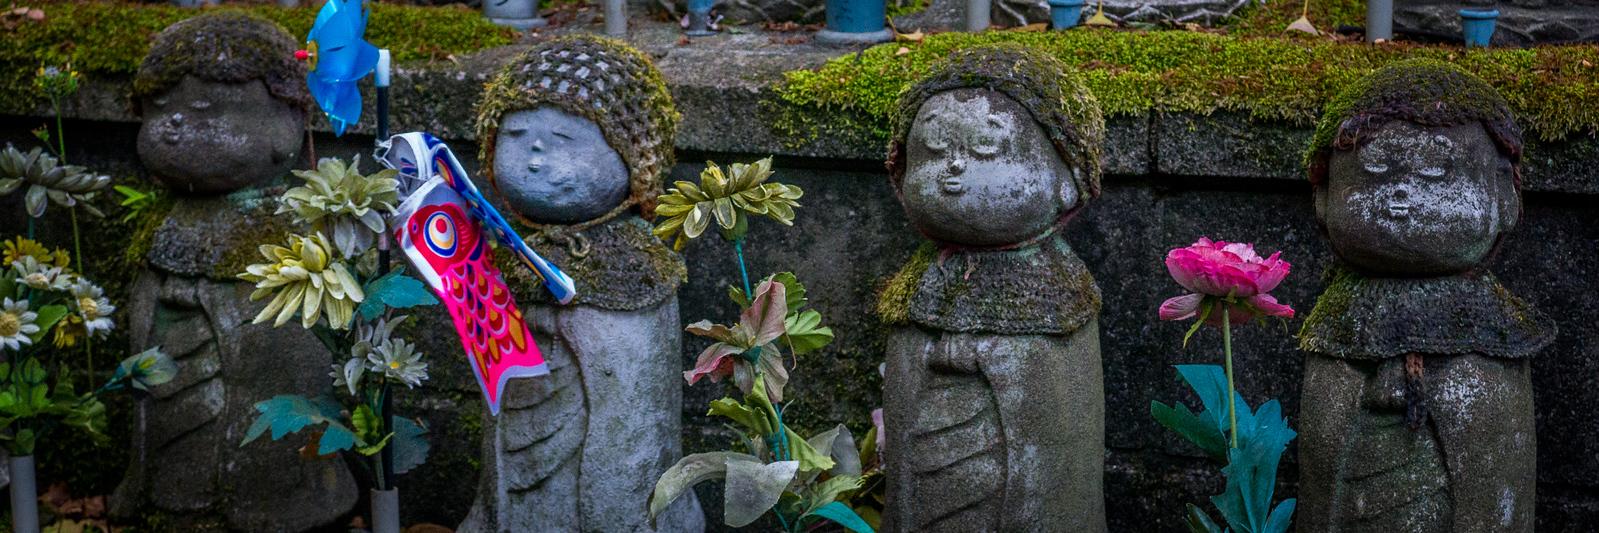 Jizo statues at Zojo-ji Temple